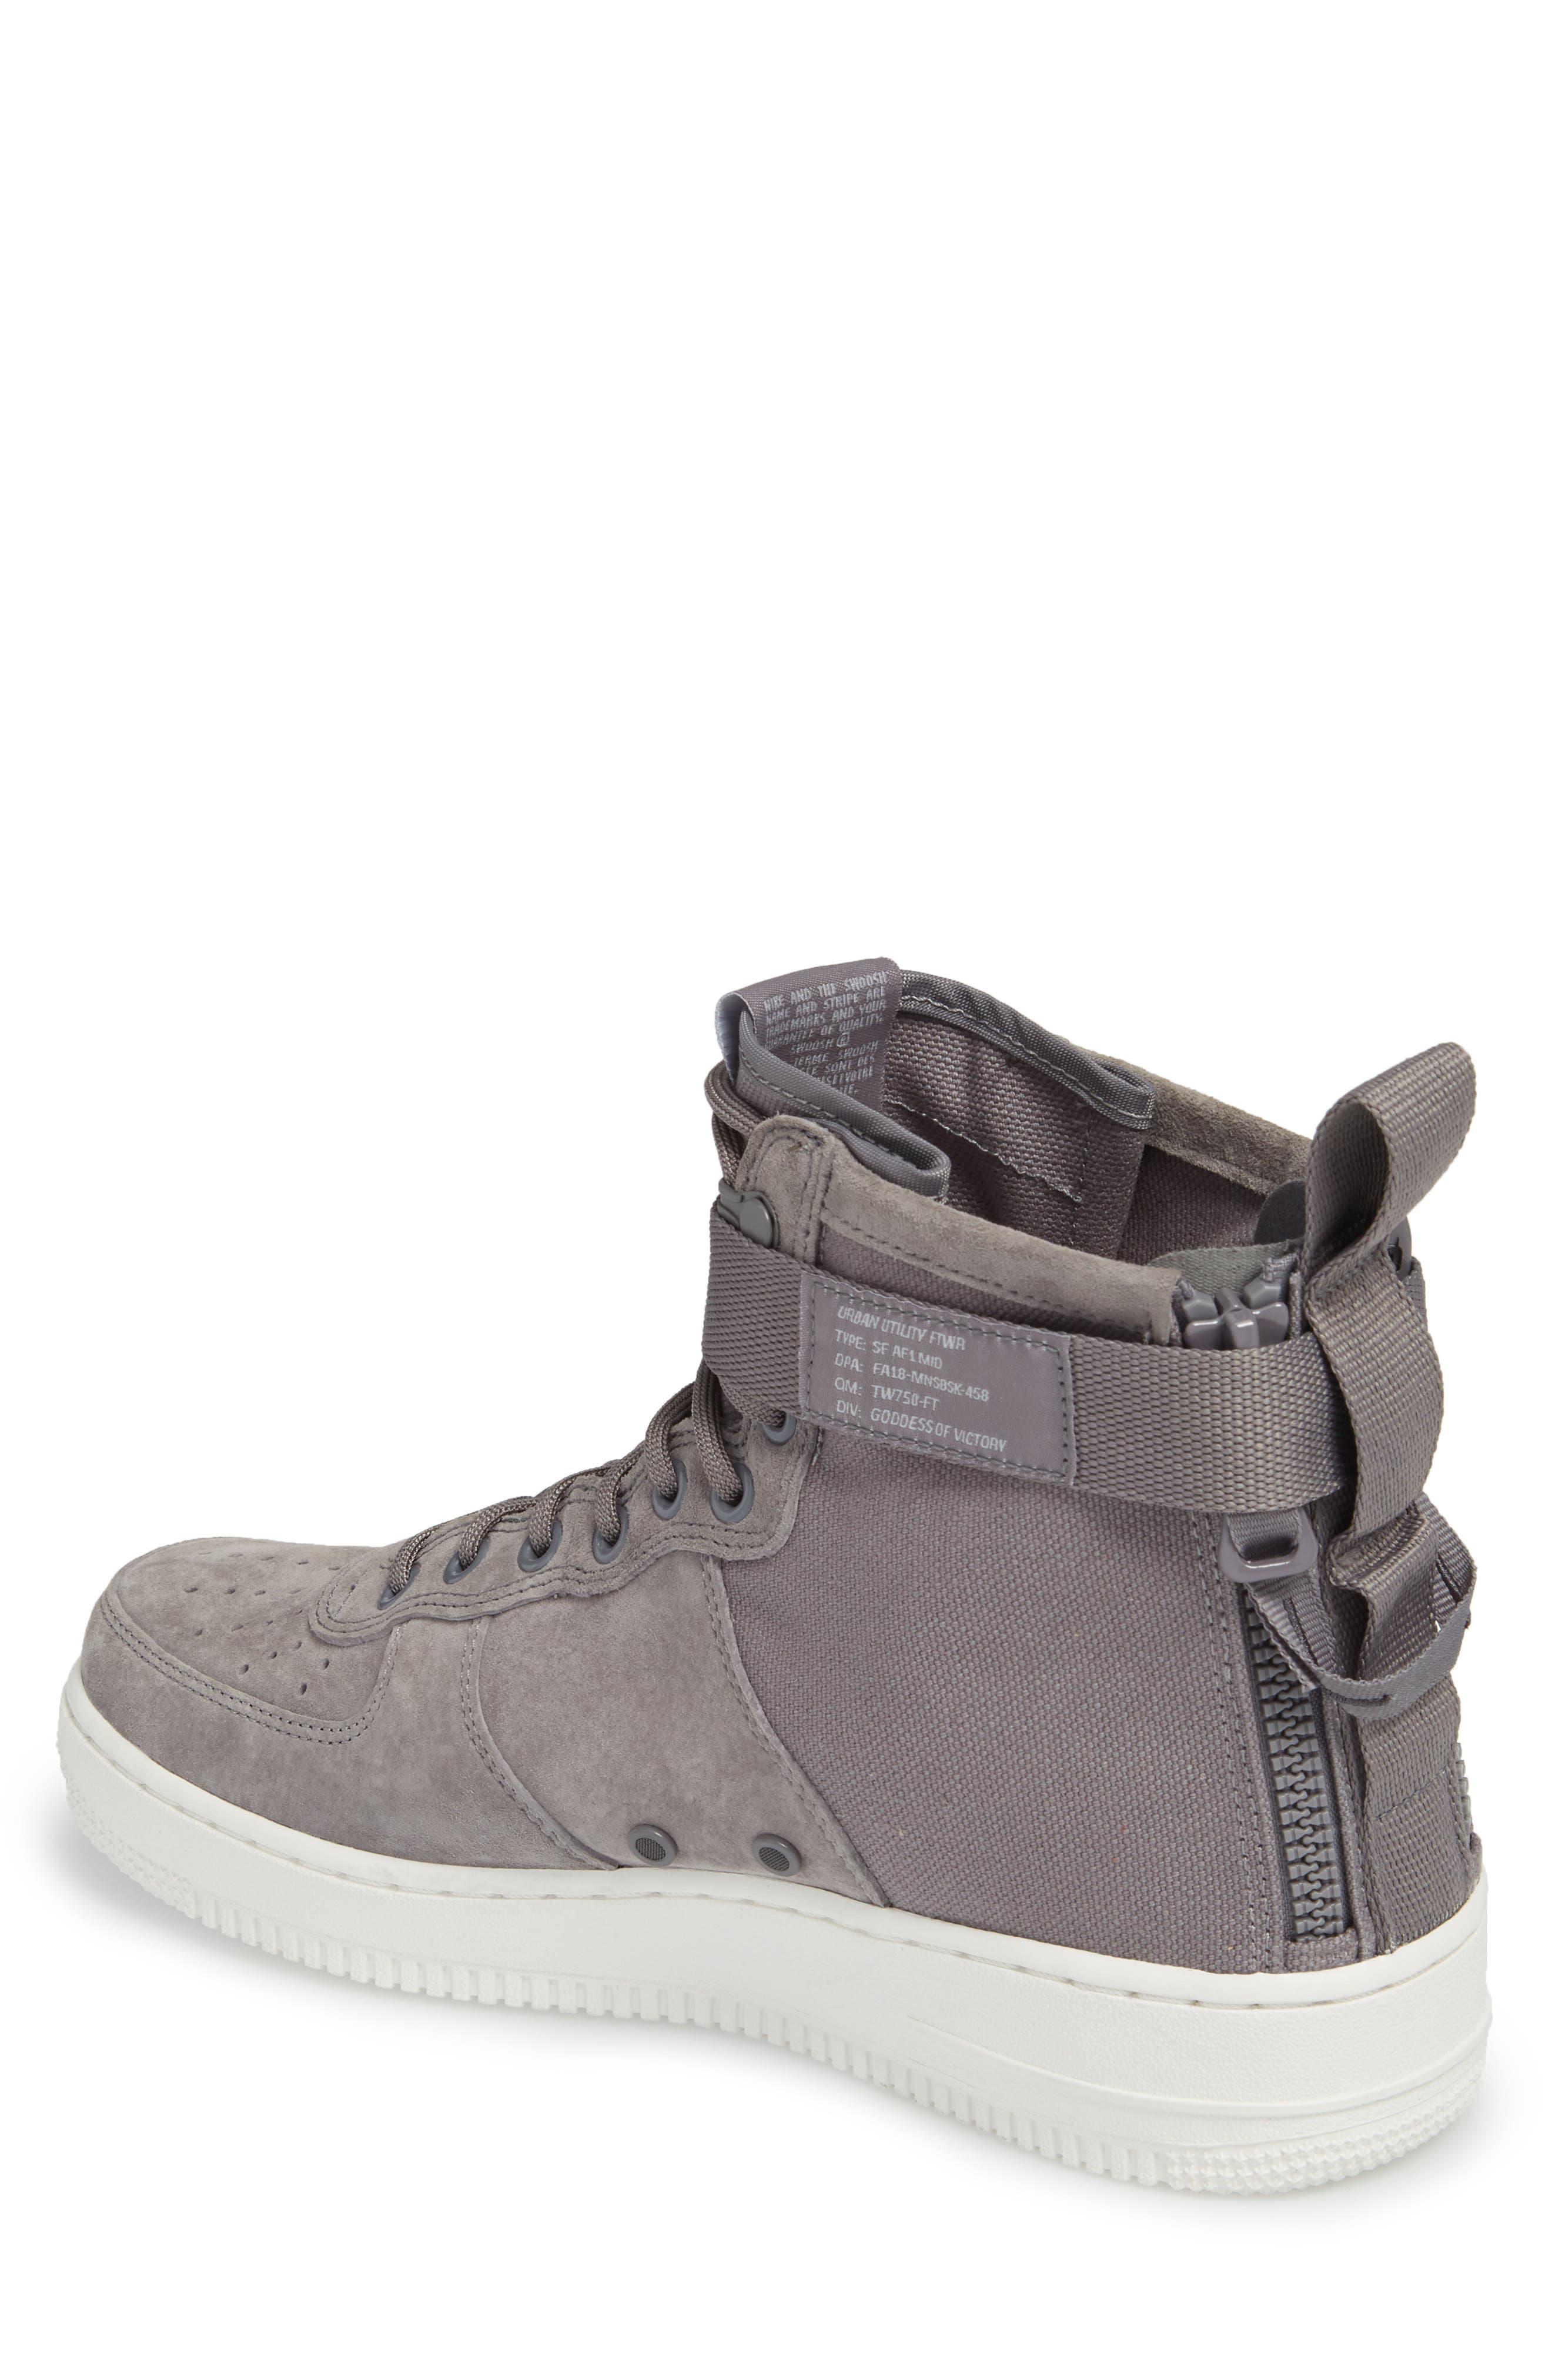 SF Air Force 1 Mid Sneaker,                             Alternate thumbnail 2, color,                             Gunsmoke/ Wolf Grey/ White